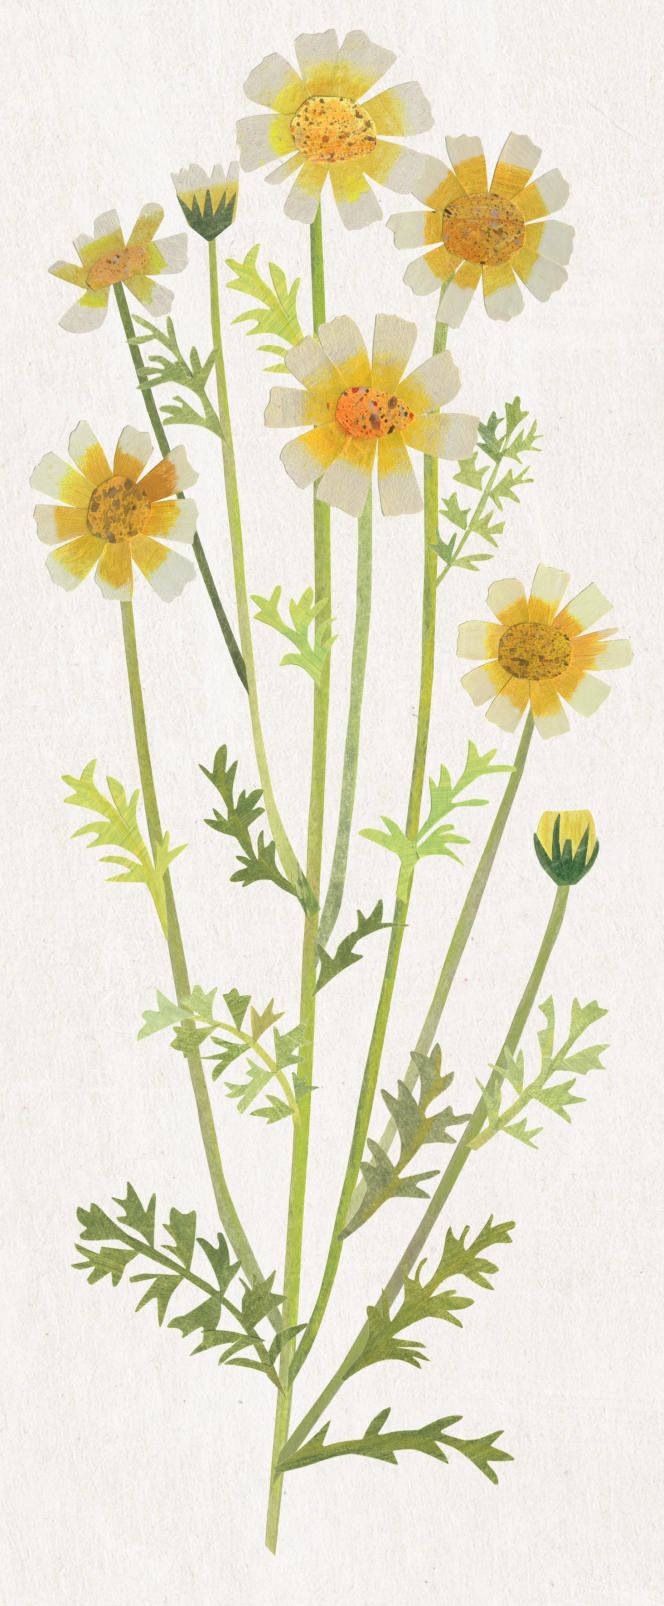 Chrysanthème comestible (Chrysanthemum coronarium).